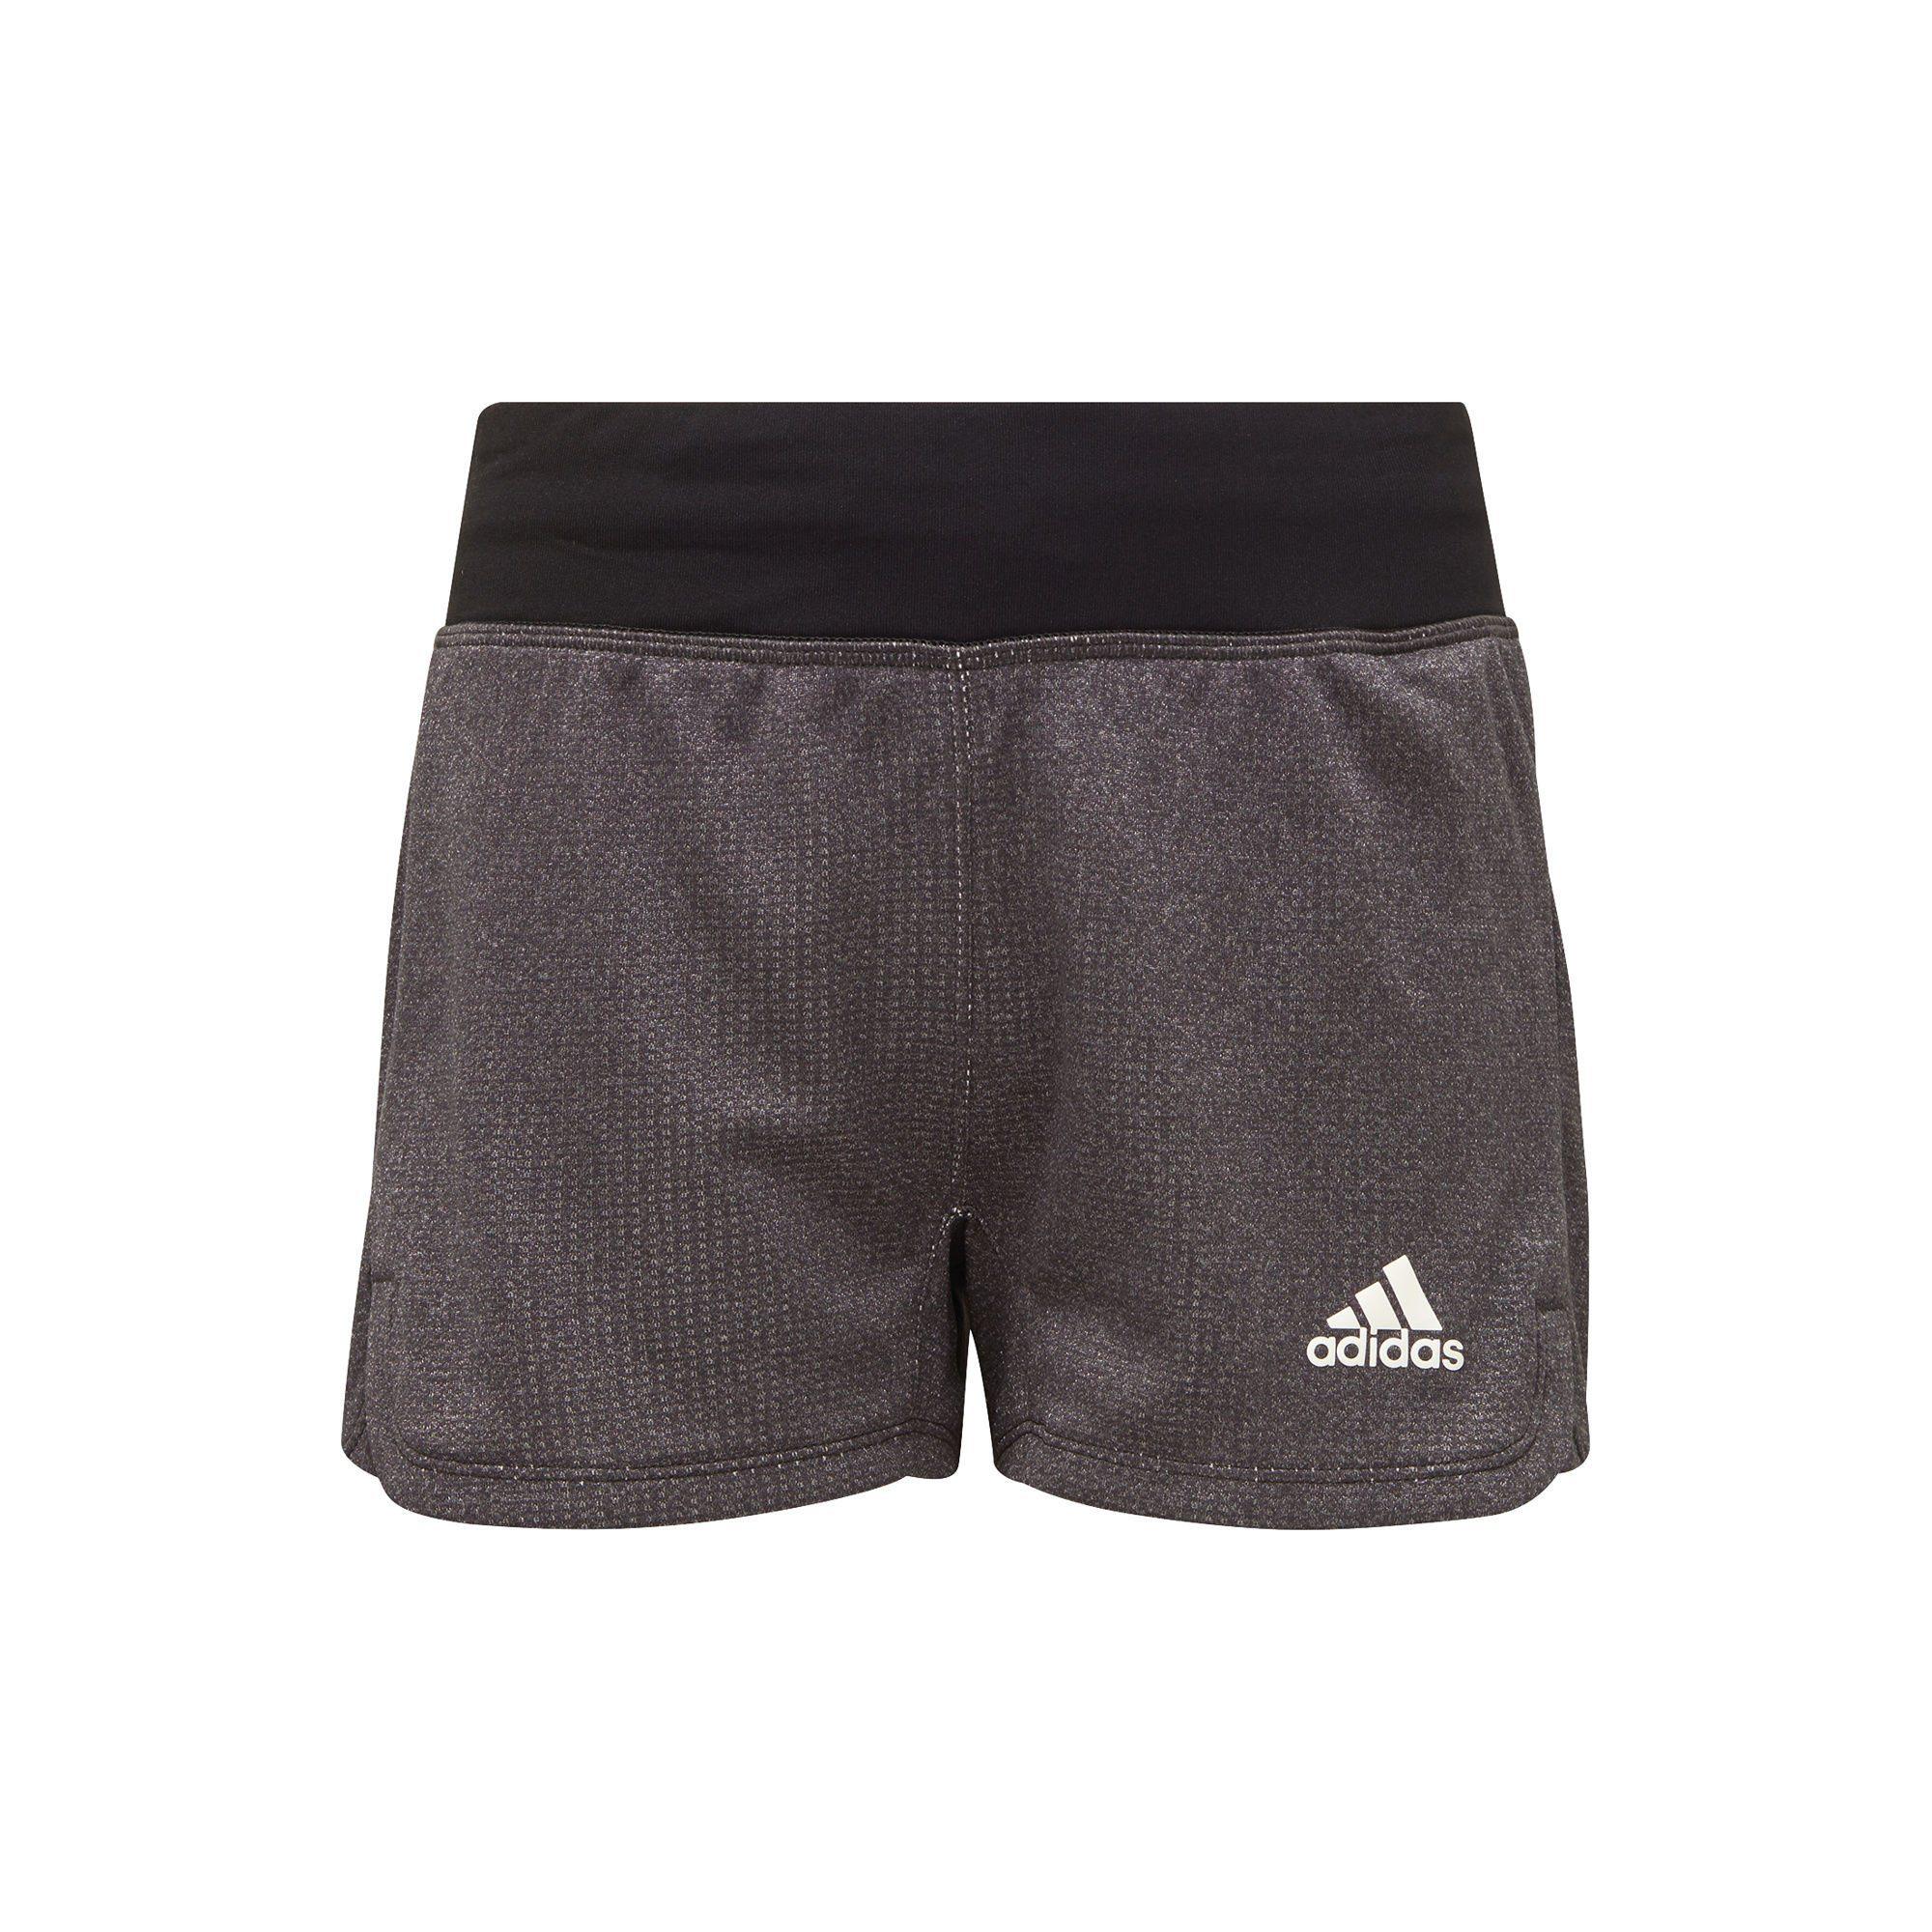 adidas Performance Shorts »Training Chill Shorts« Clima online kaufen | OTTO